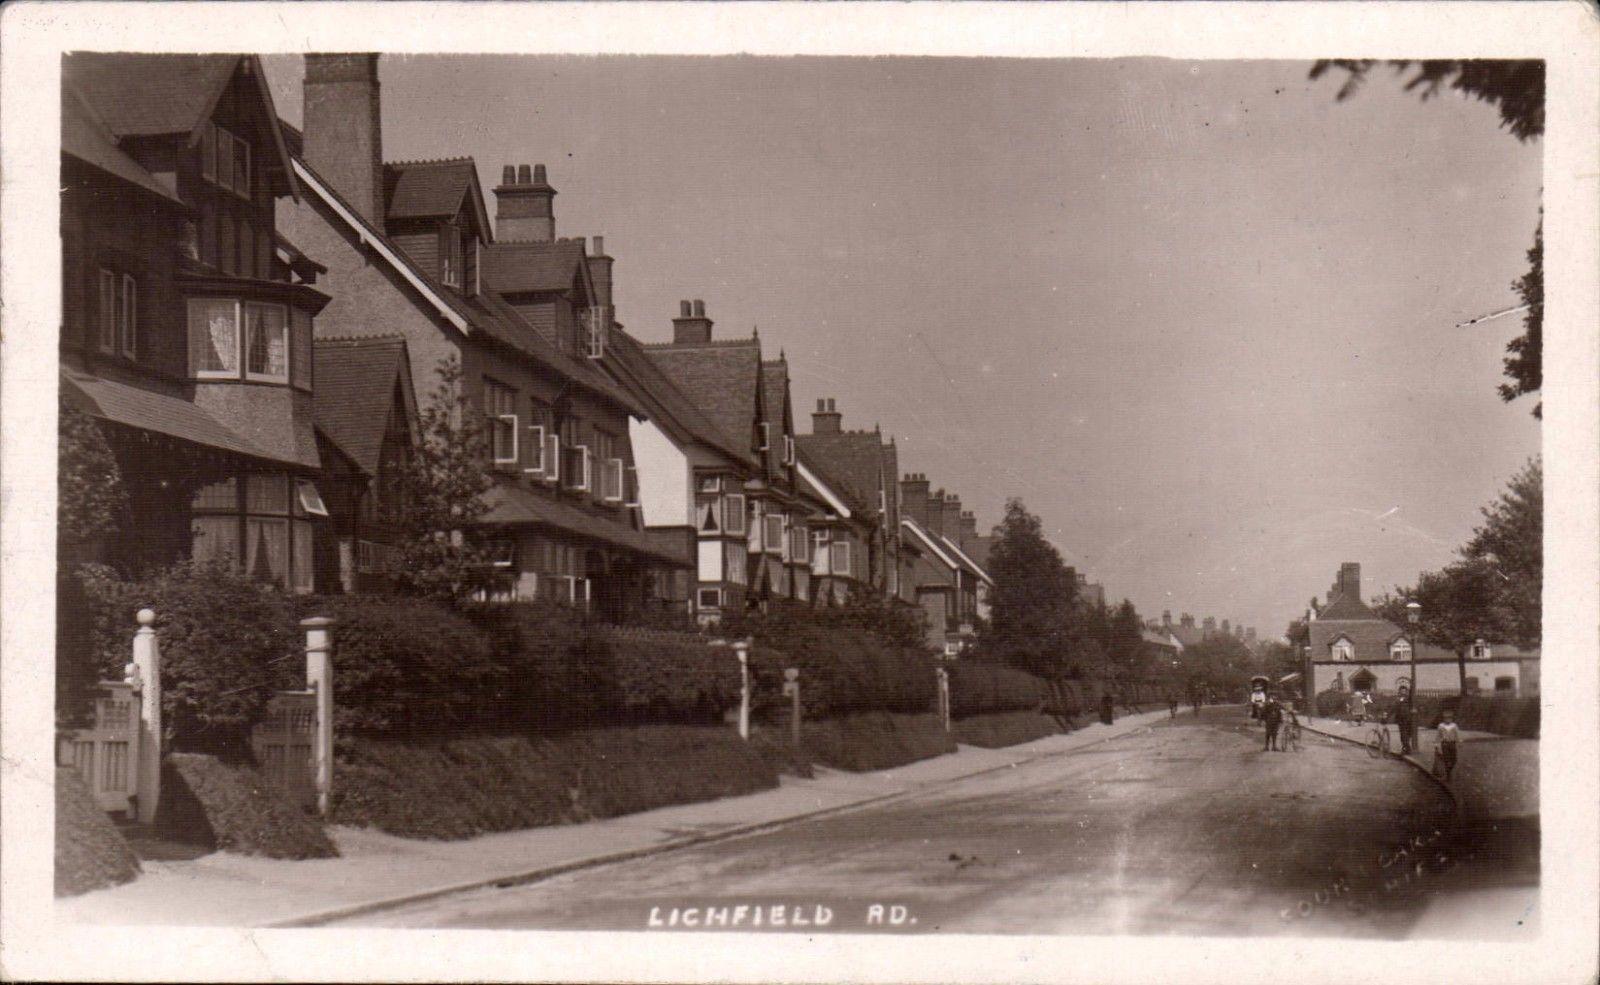 Lichfield Road opposite Cremorne Road